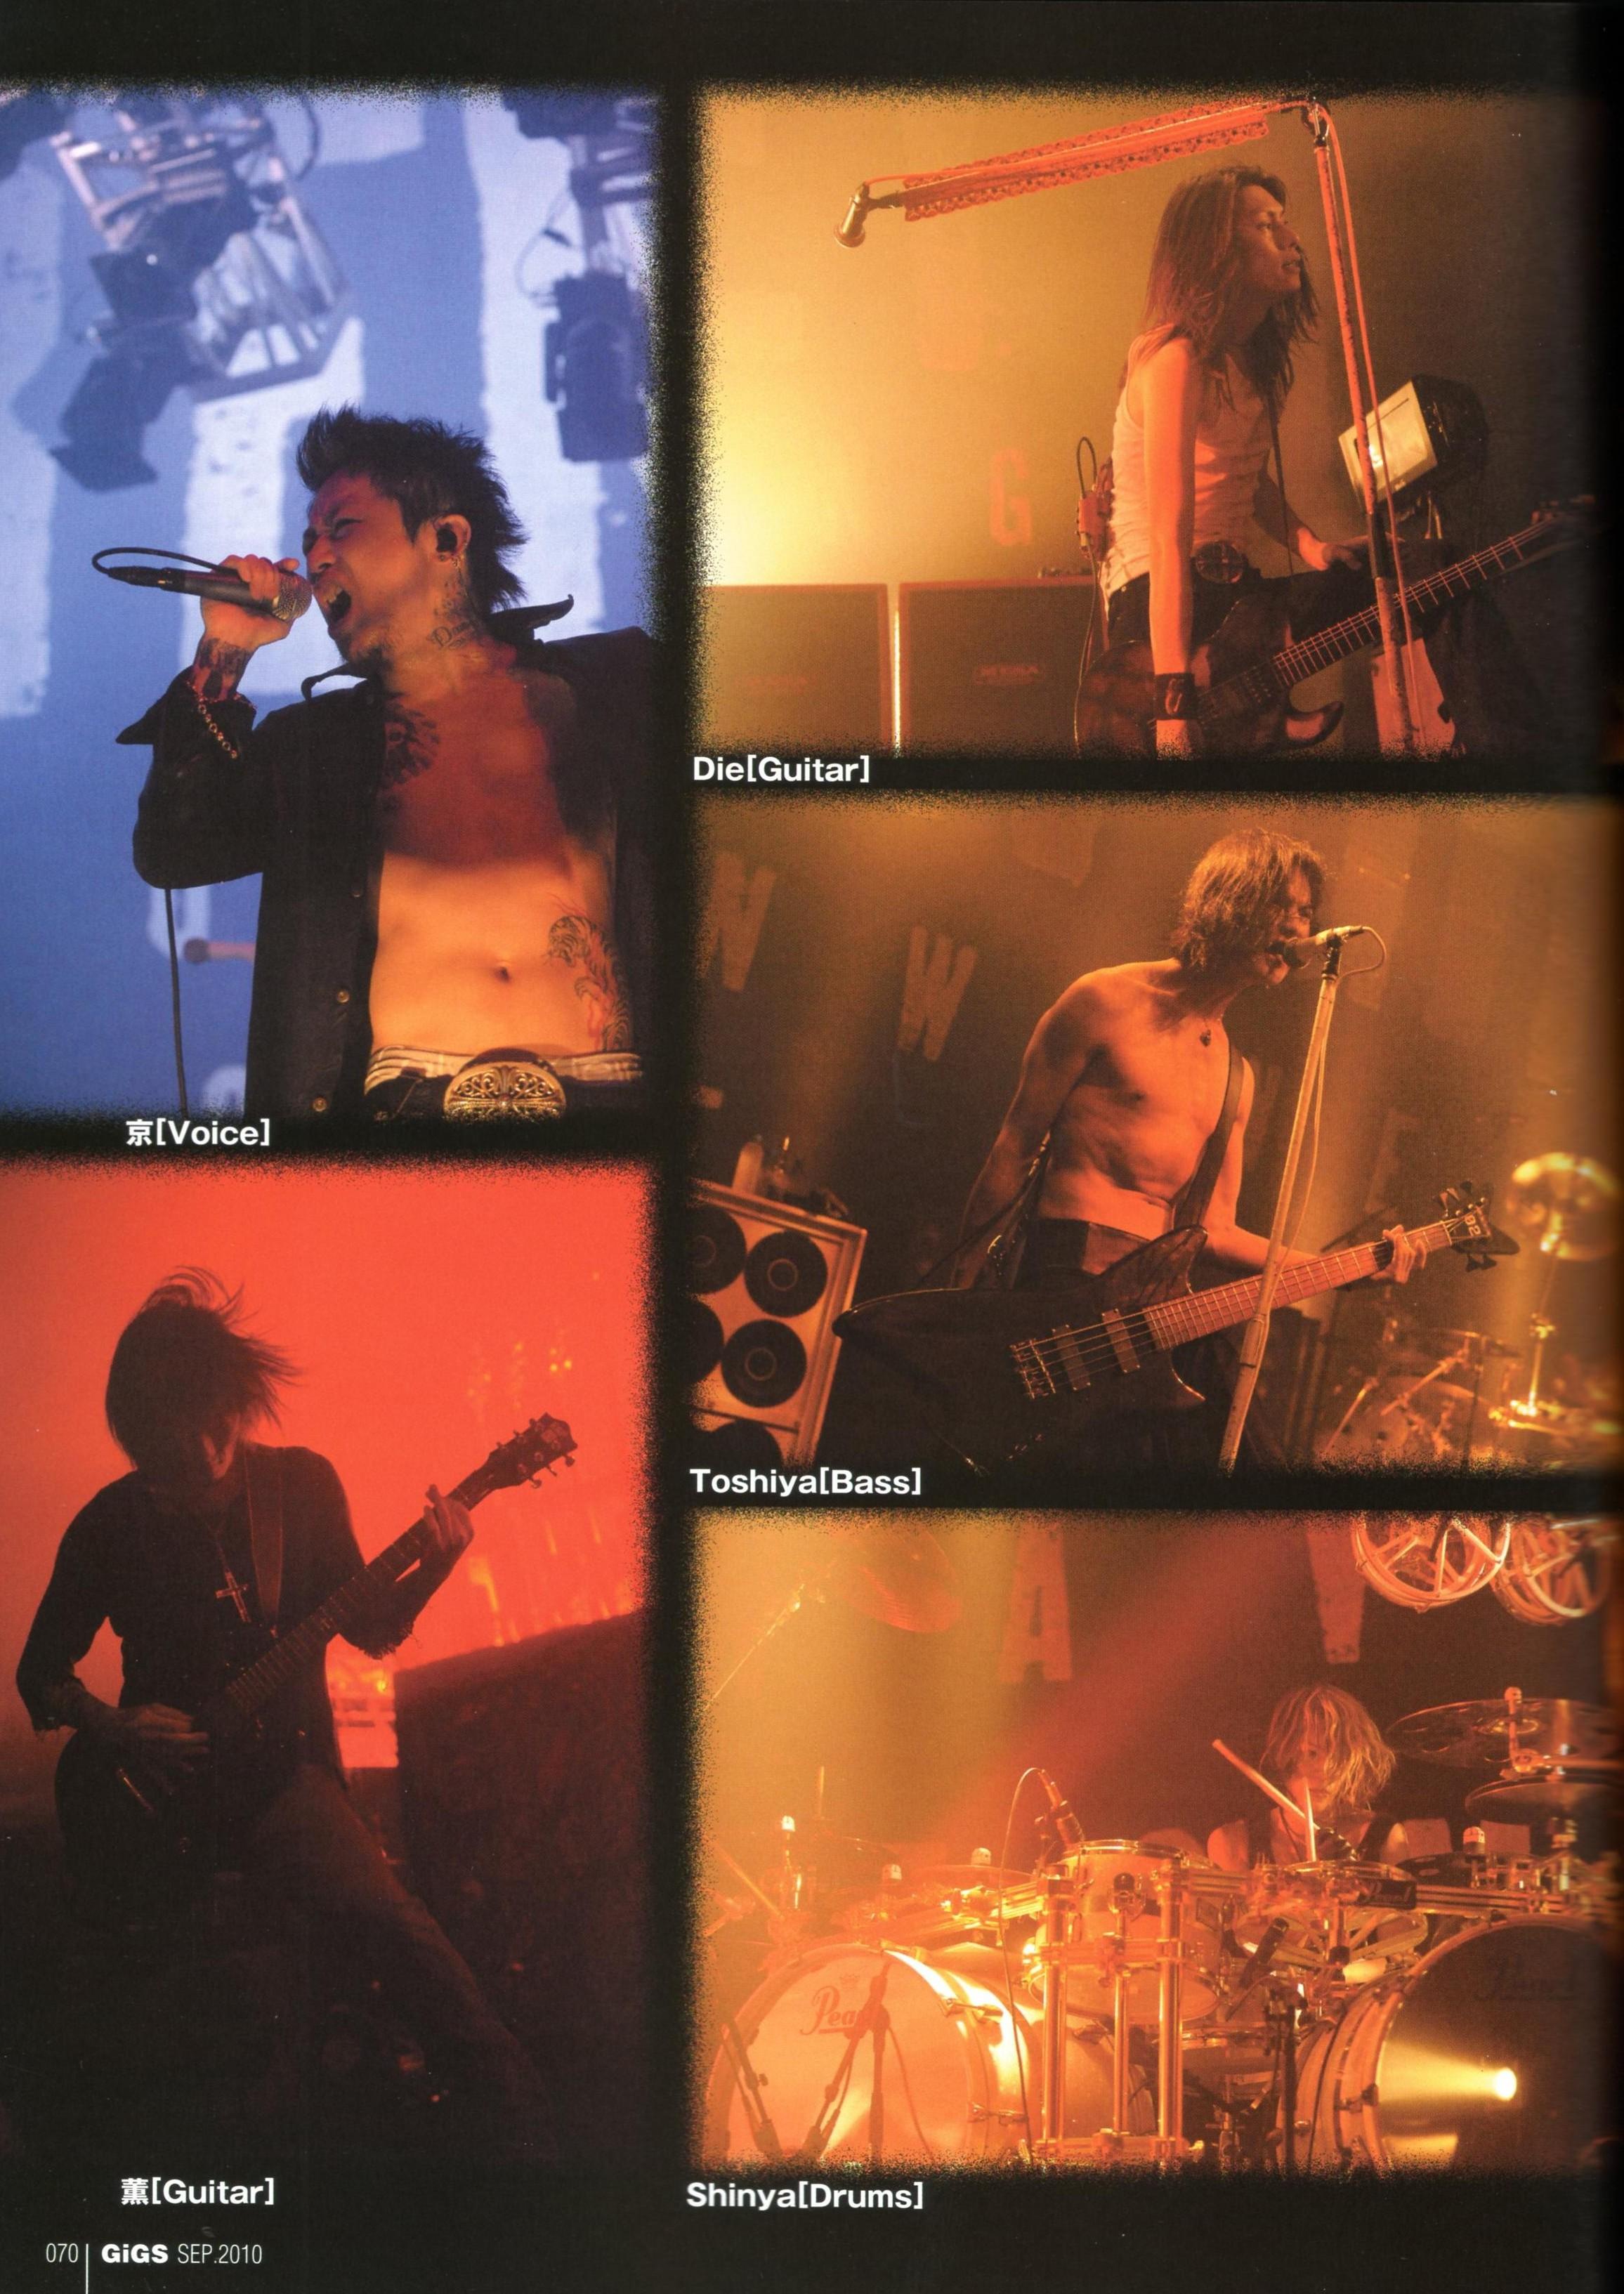 http://pics.livejournal.com/diesbitch915/pic/0019sdzr